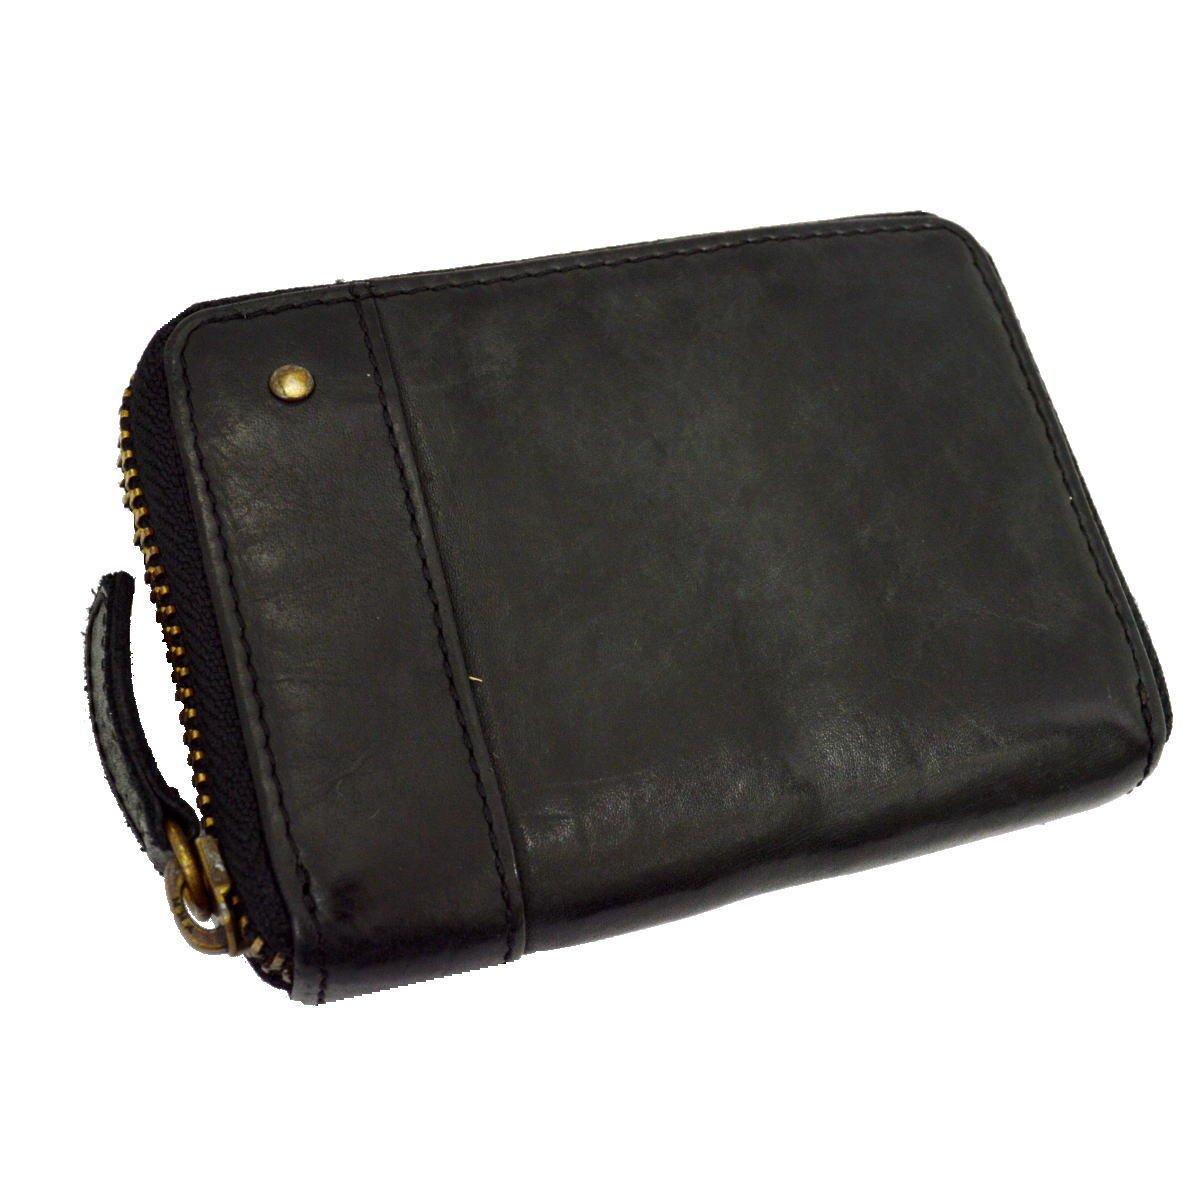 [GRUNGEALL]コインケース 革 メンズ レディース 小銭入れ カードケース 財布 GR171 B071V517WV ブラック ブラック